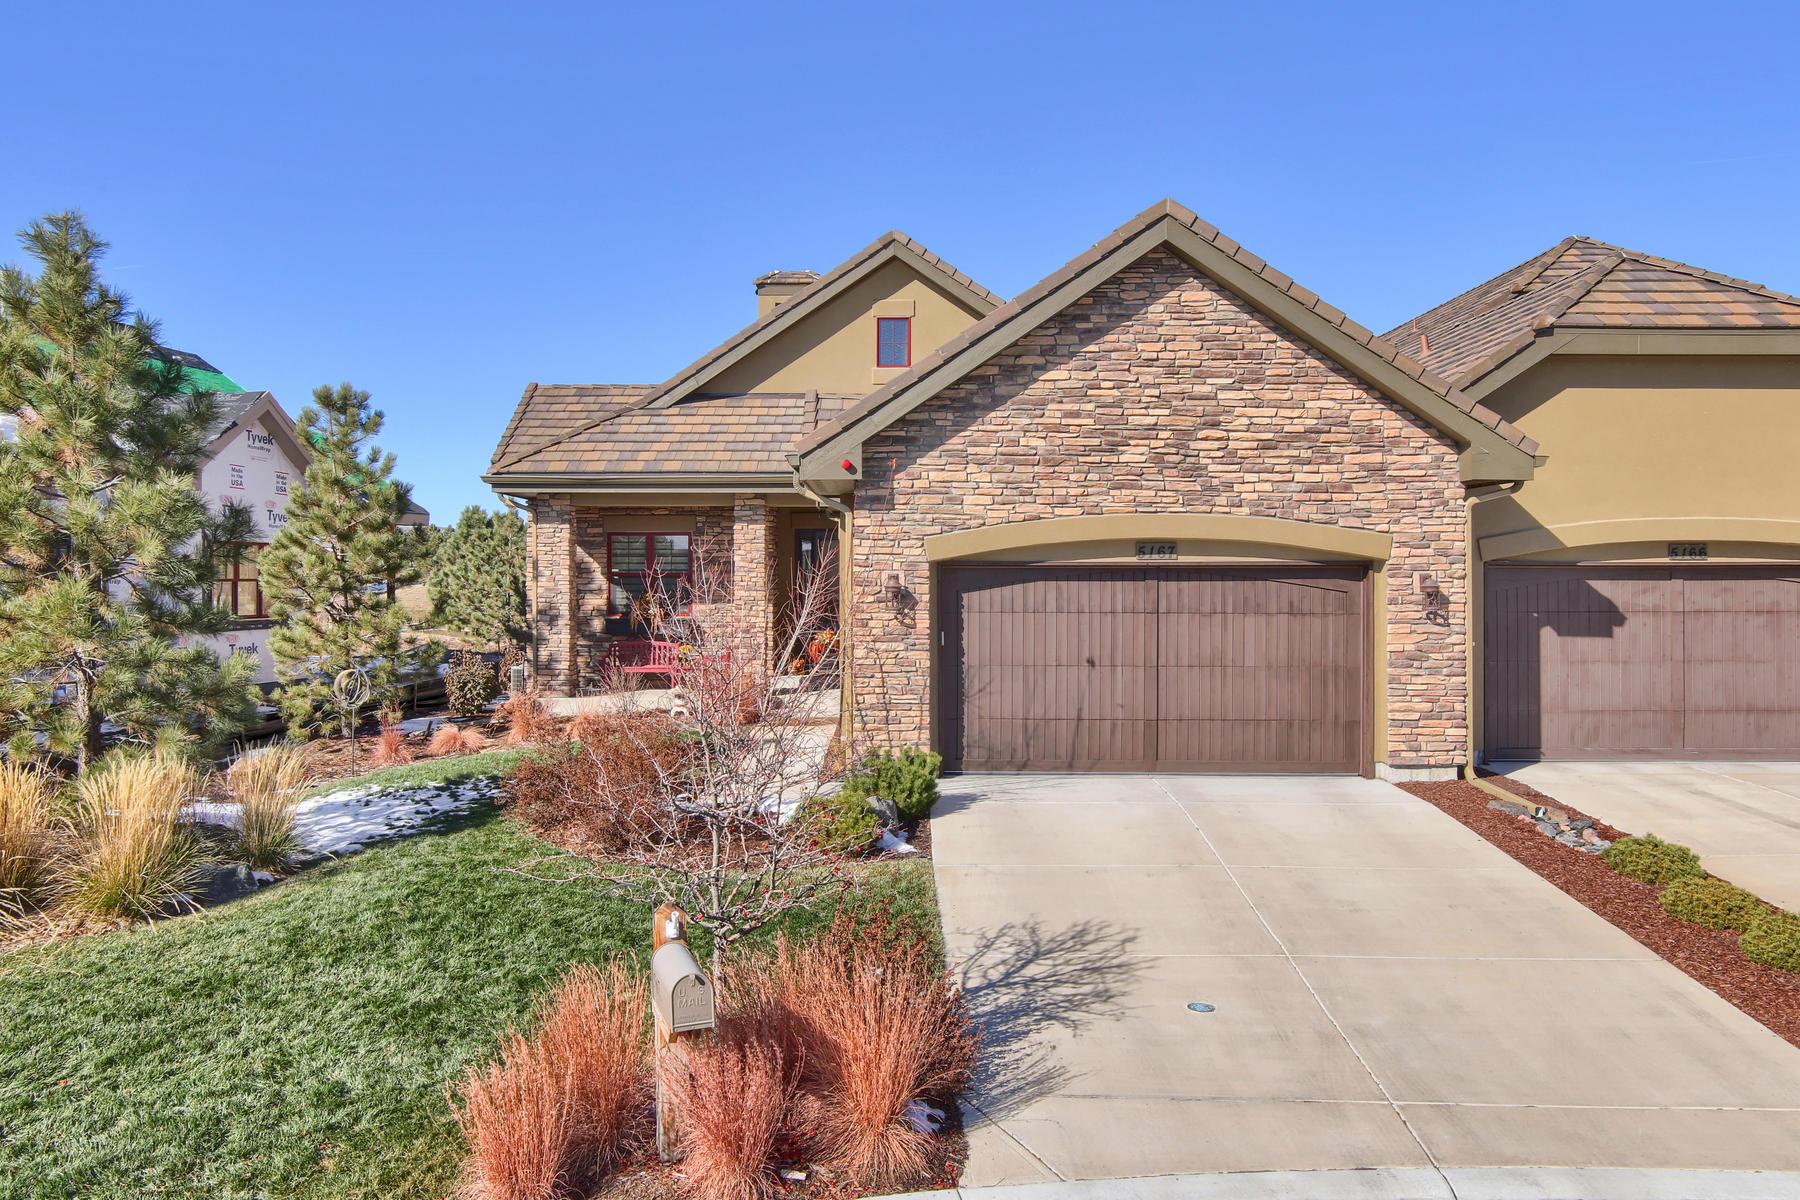 Single Family Home for Active at 5167 Le Duc Dr 5167 Le Duc Dr Castle Rock, Colorado 80108 United States